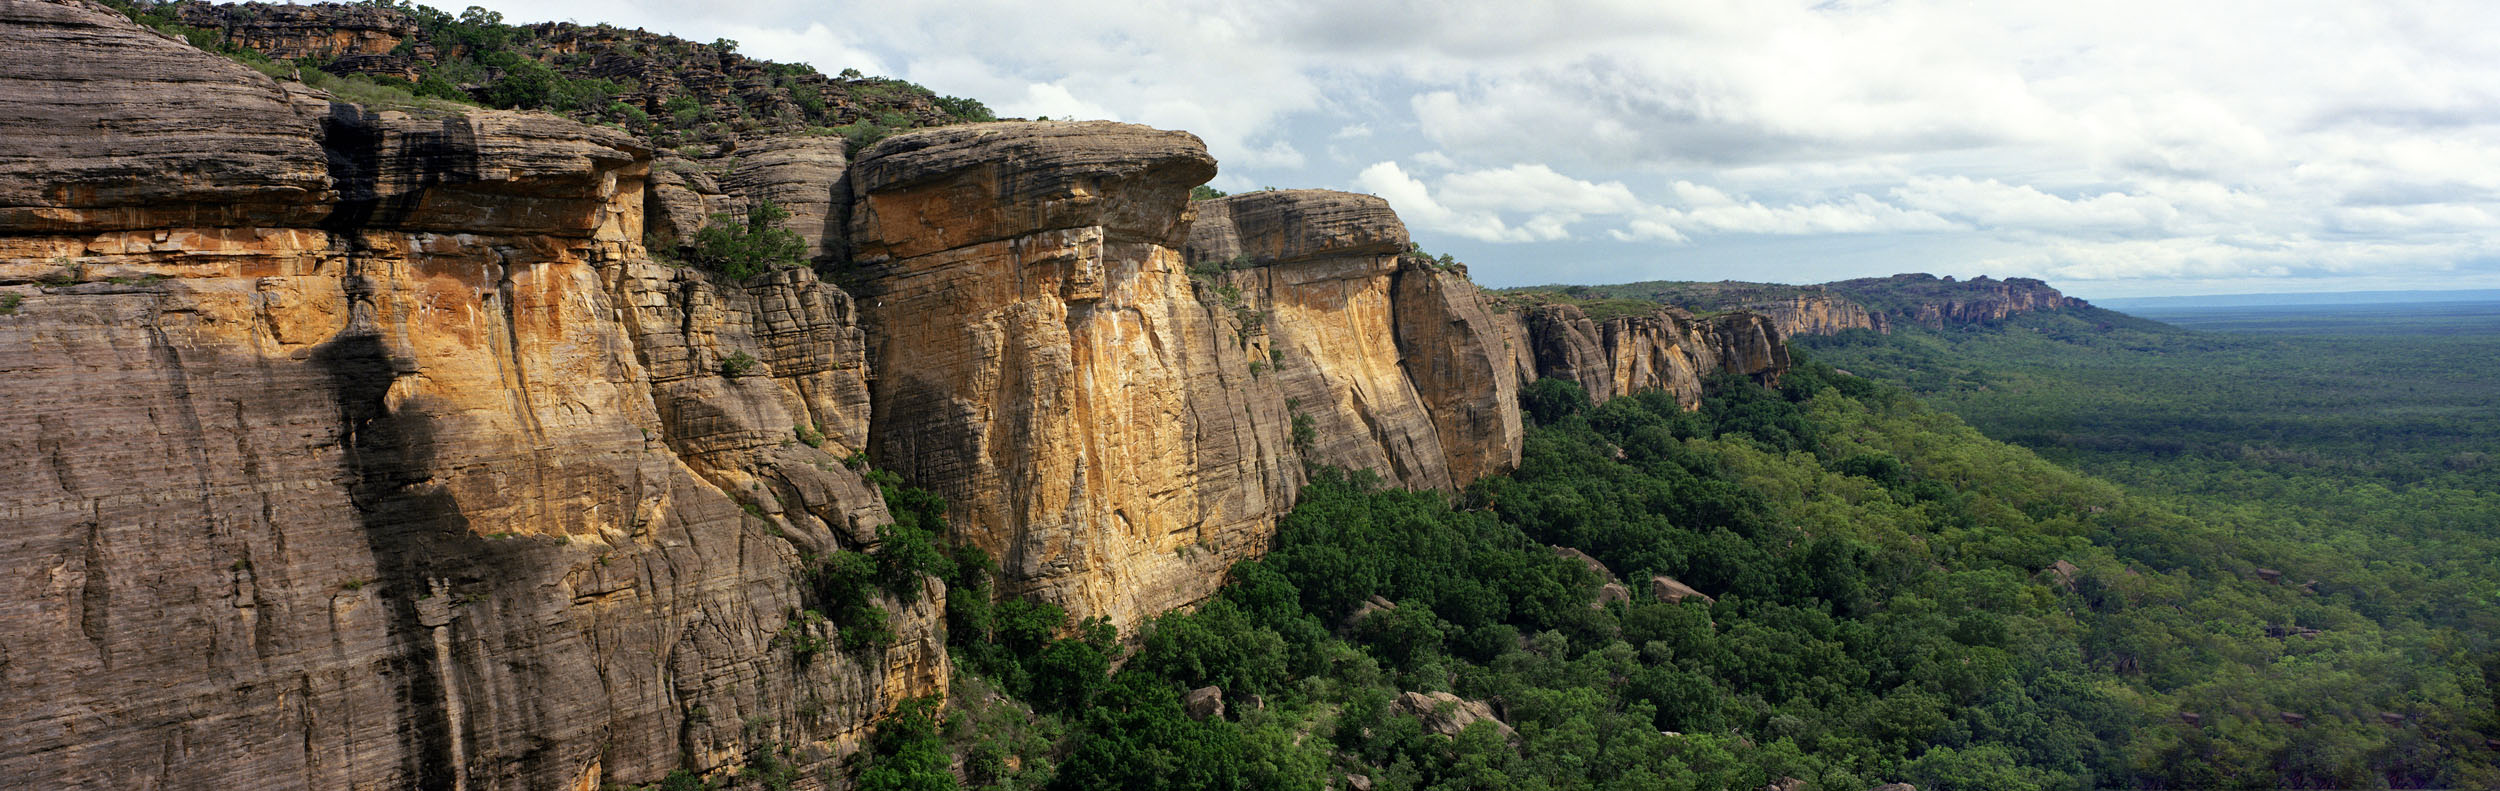 Abbruchkante im Kakadu Nationalpark Northern Territory NT Australien Header